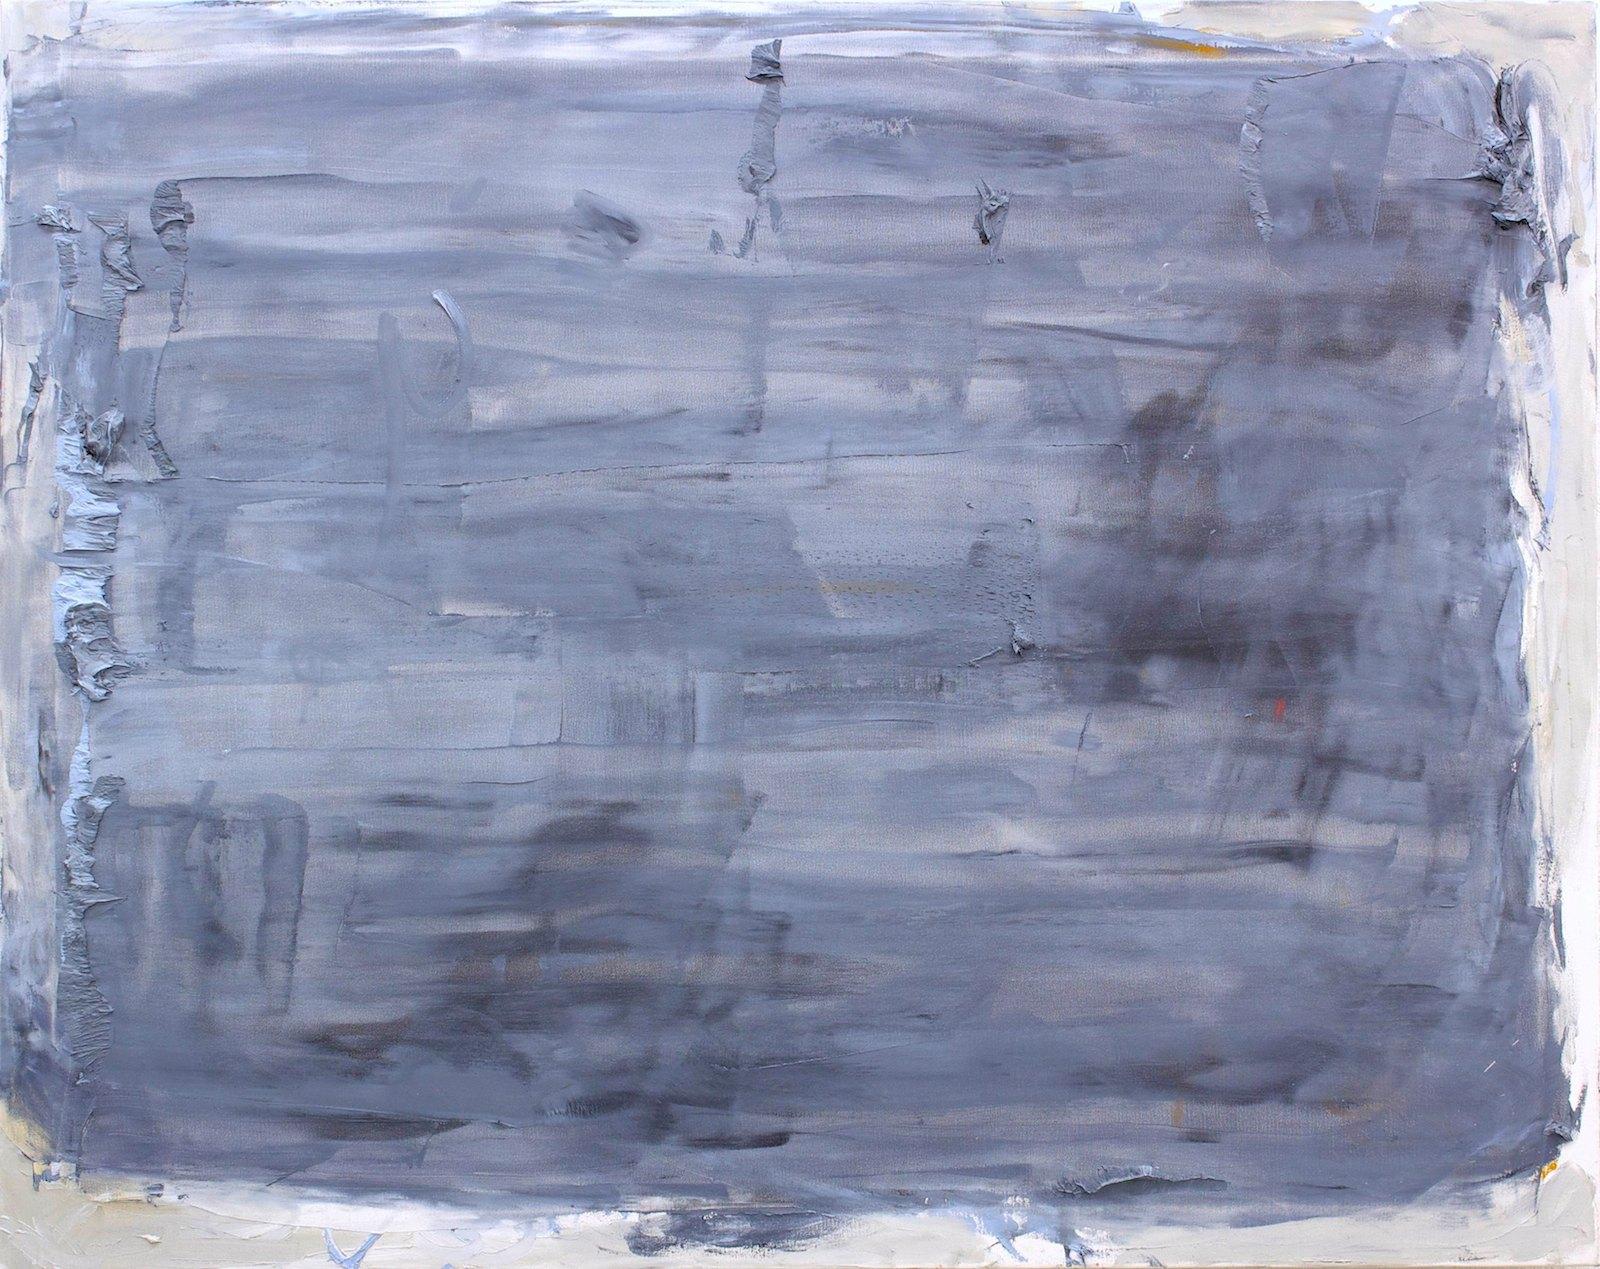 Niclas Randau, The Reading Light (blue ochre), 2014, oil on canvas, 117 x 146 cm